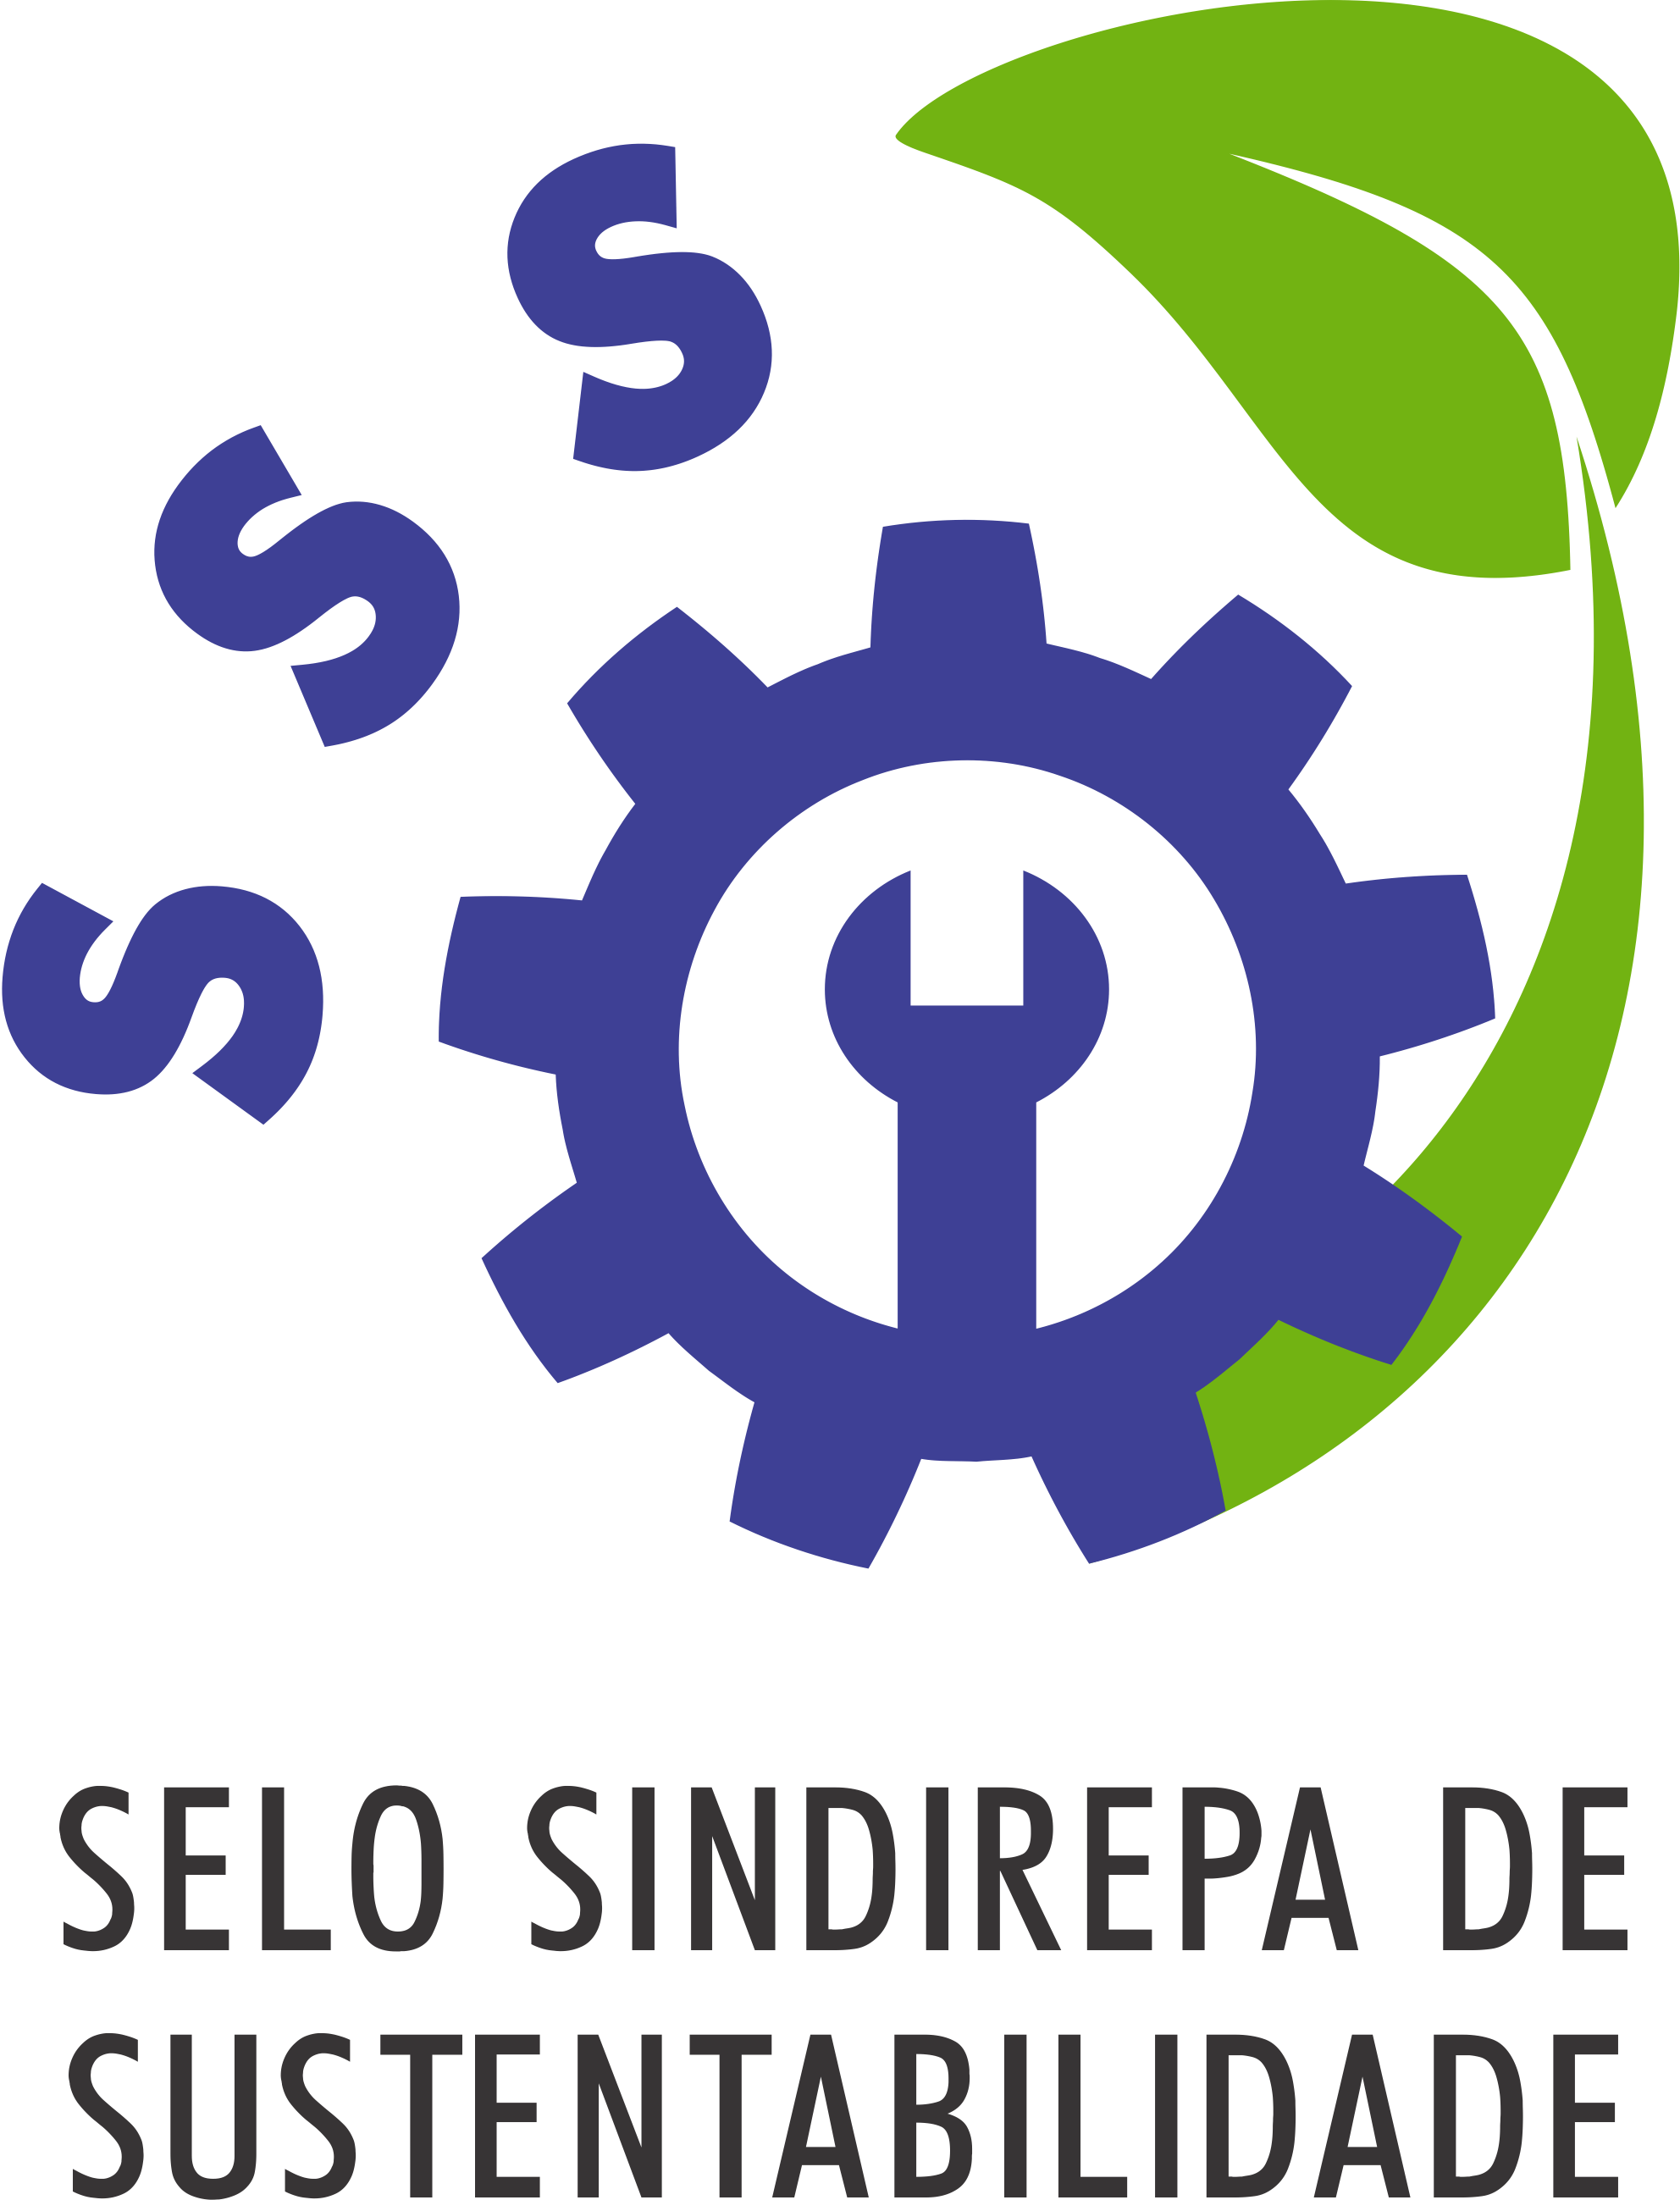 Selo-Sindirepa-Sustentabilidade